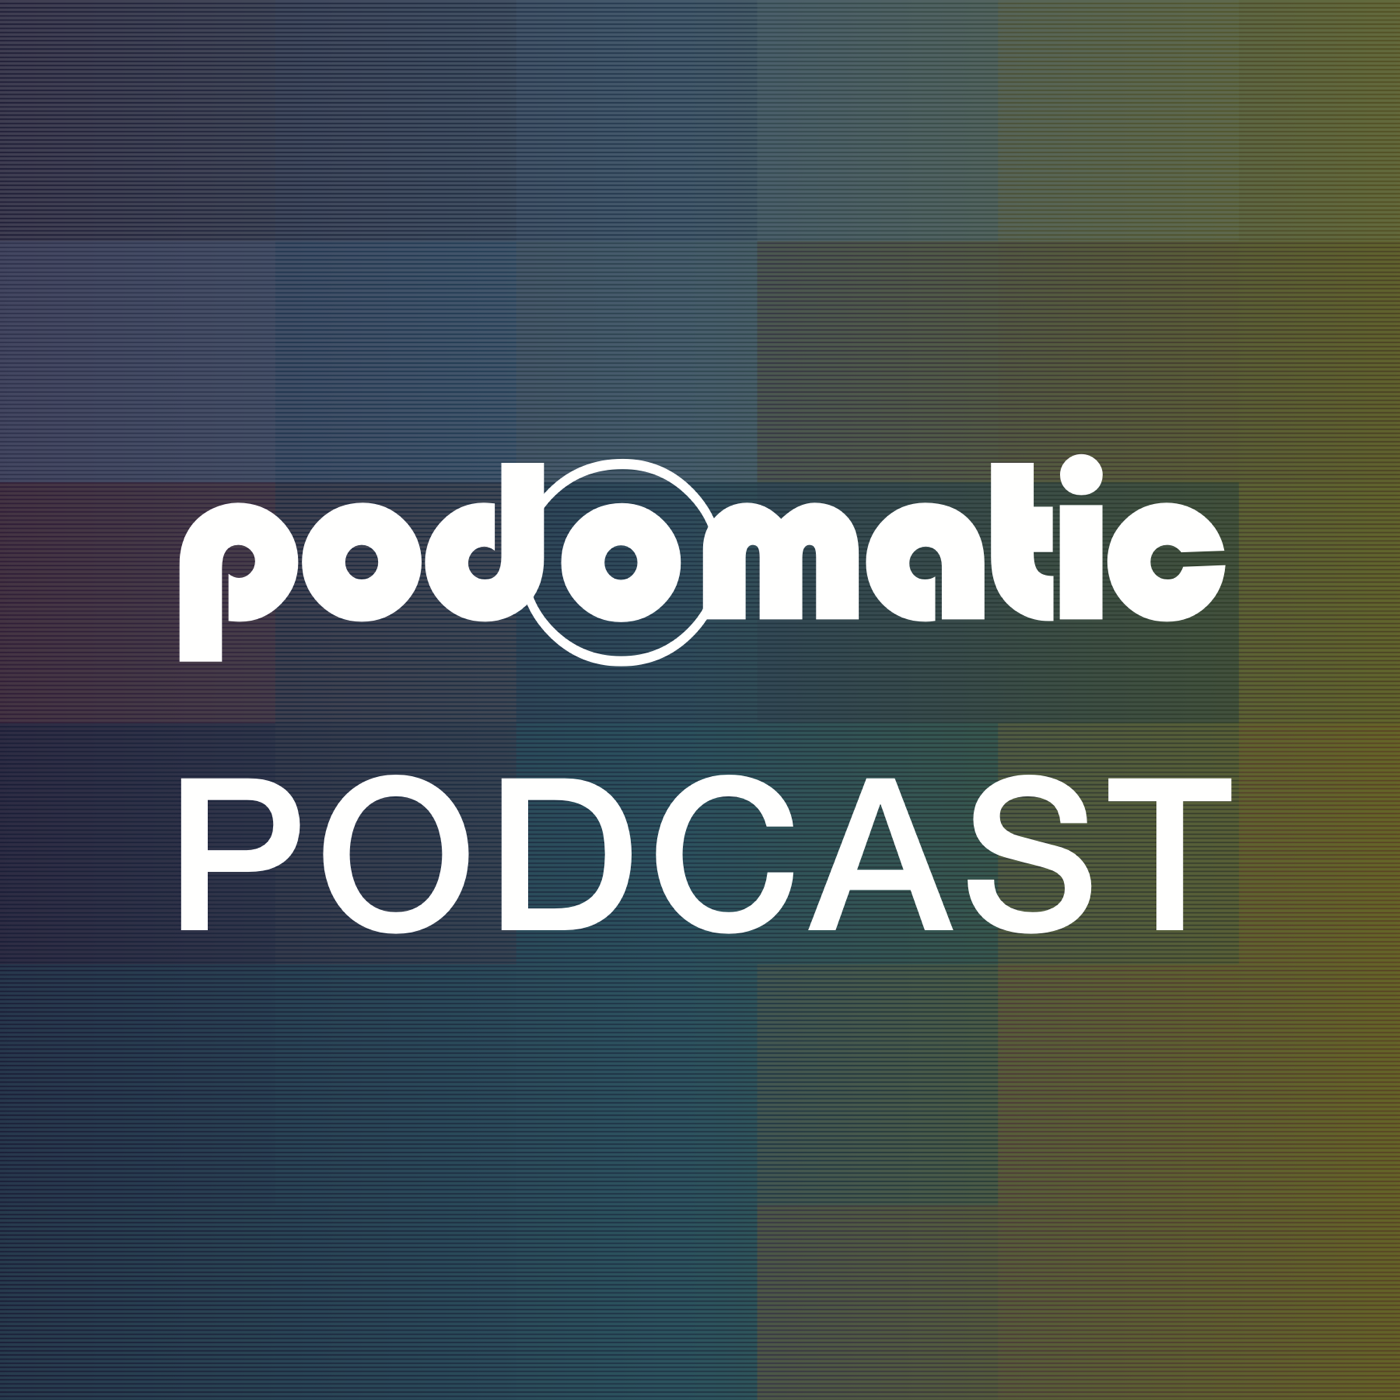 Jacob Dubois' Podcast